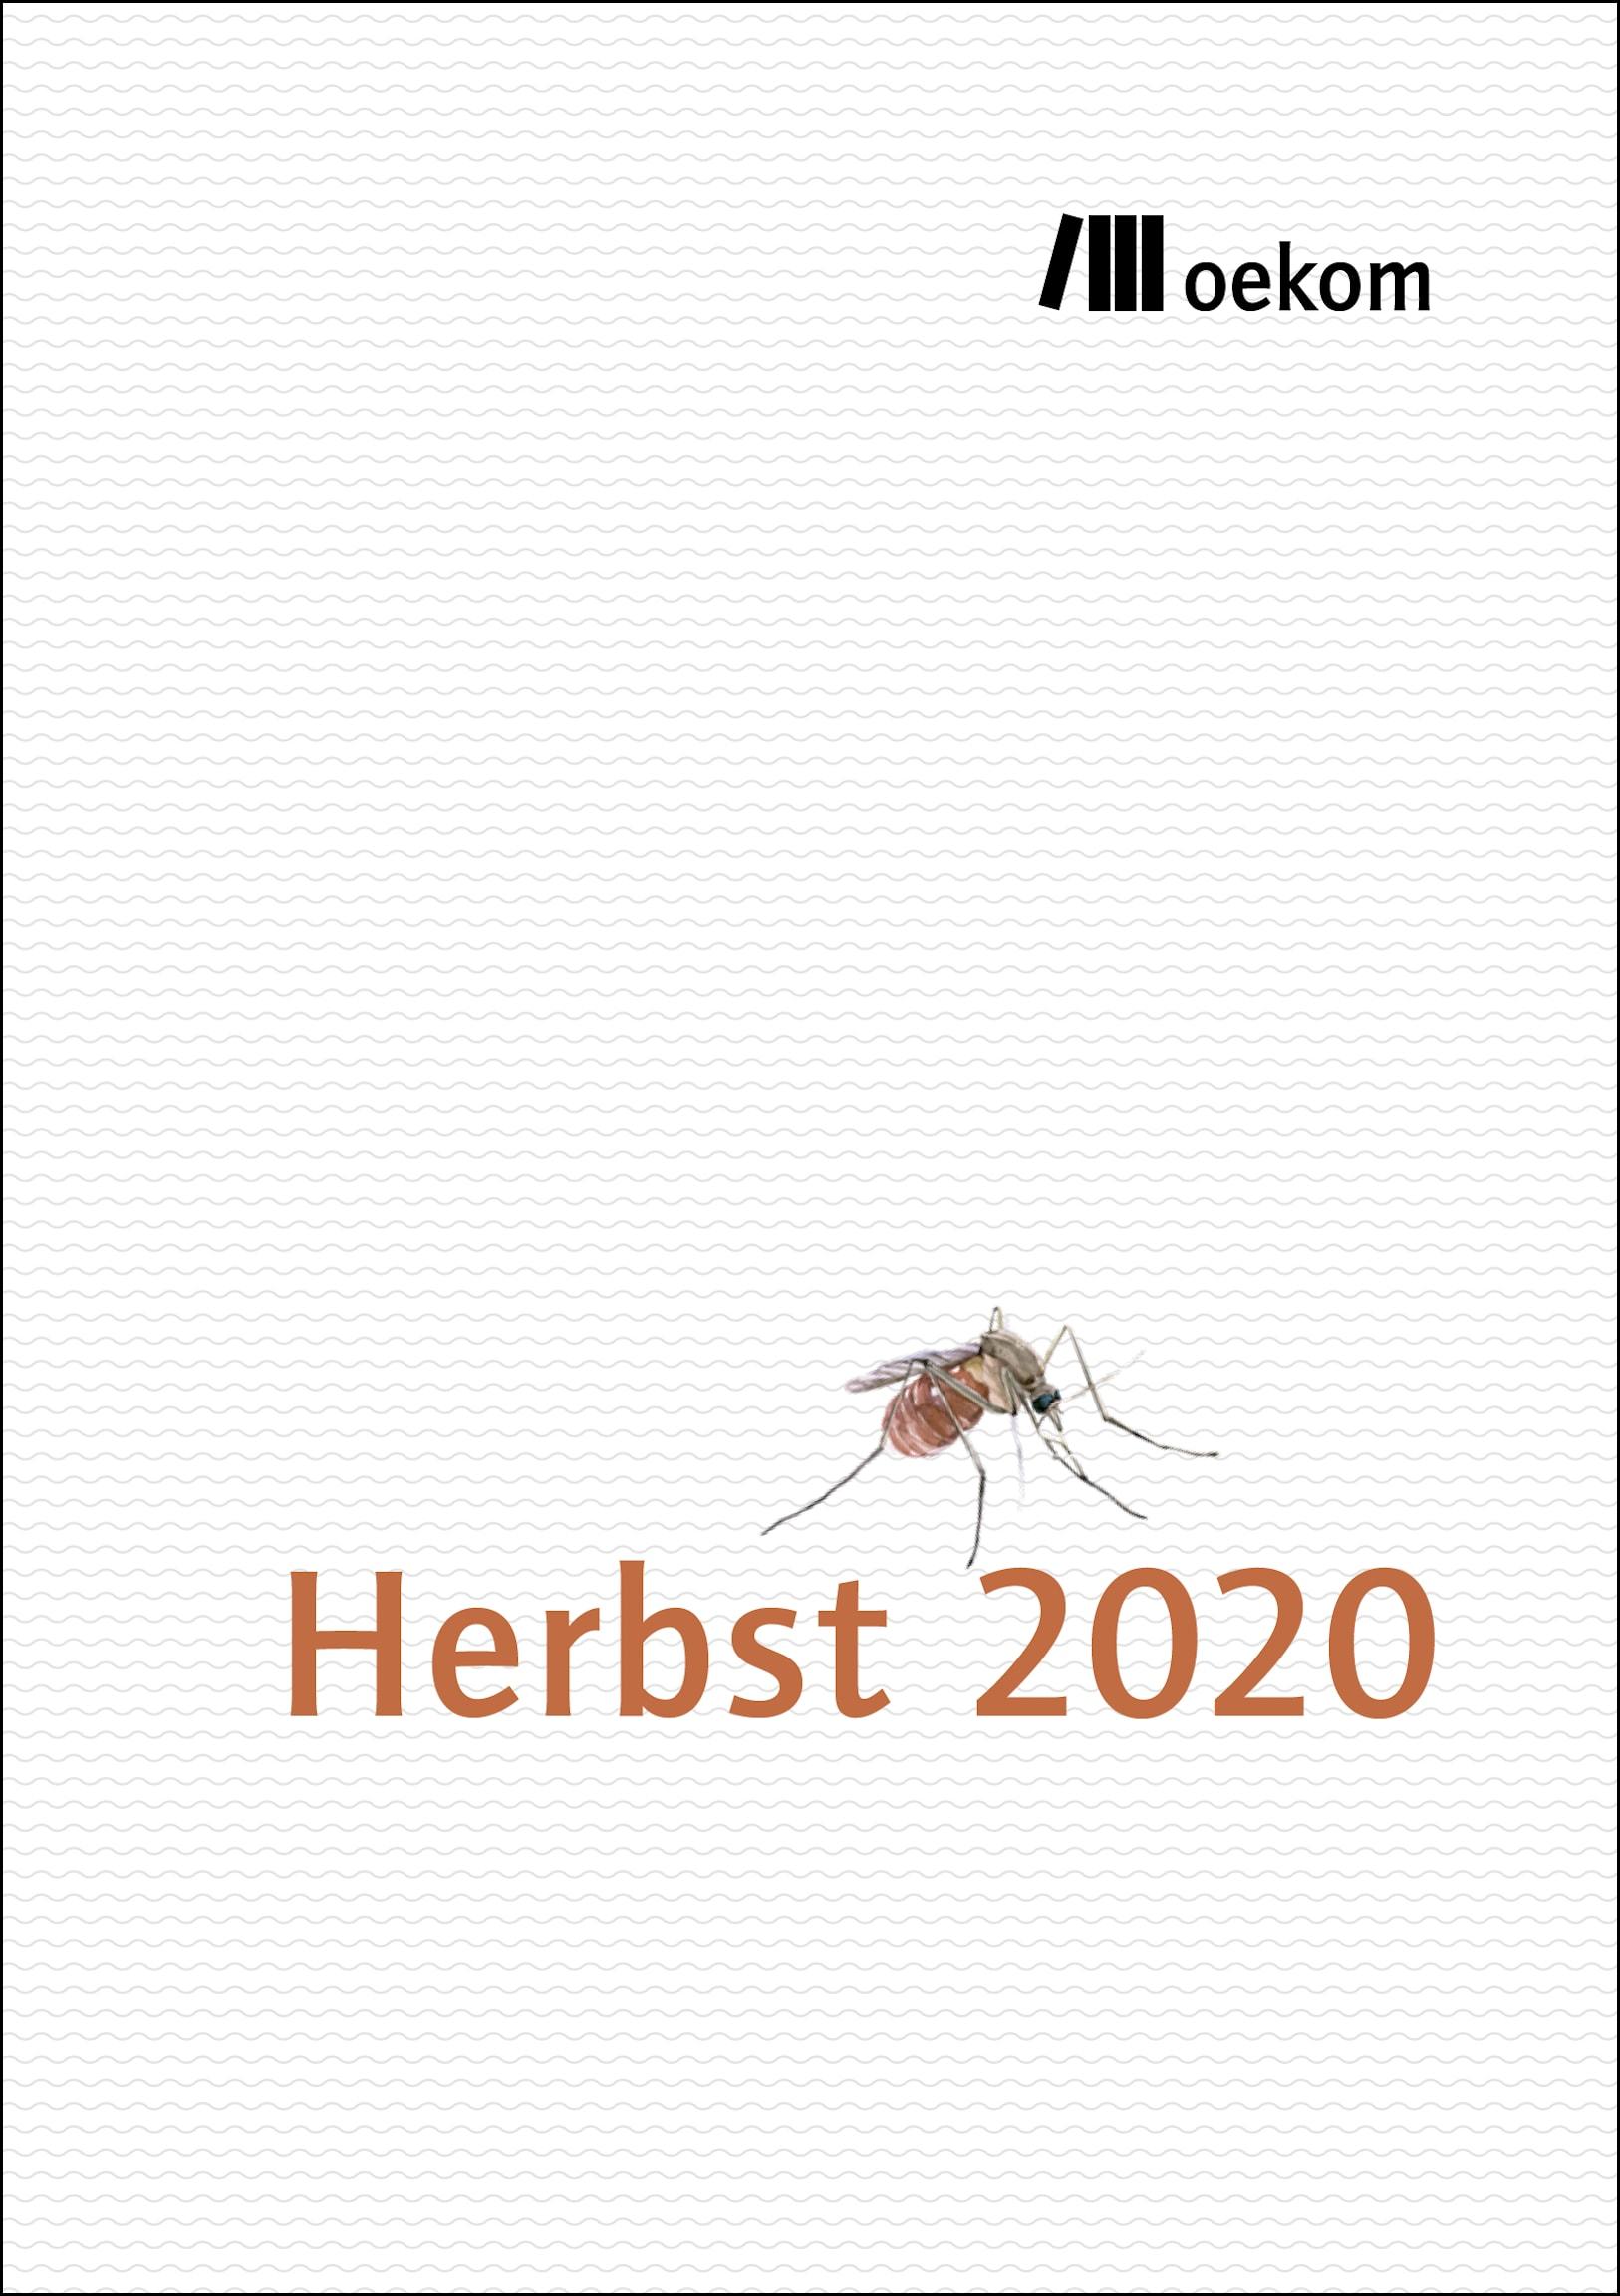 Programm oekom verlag Herbst 2020